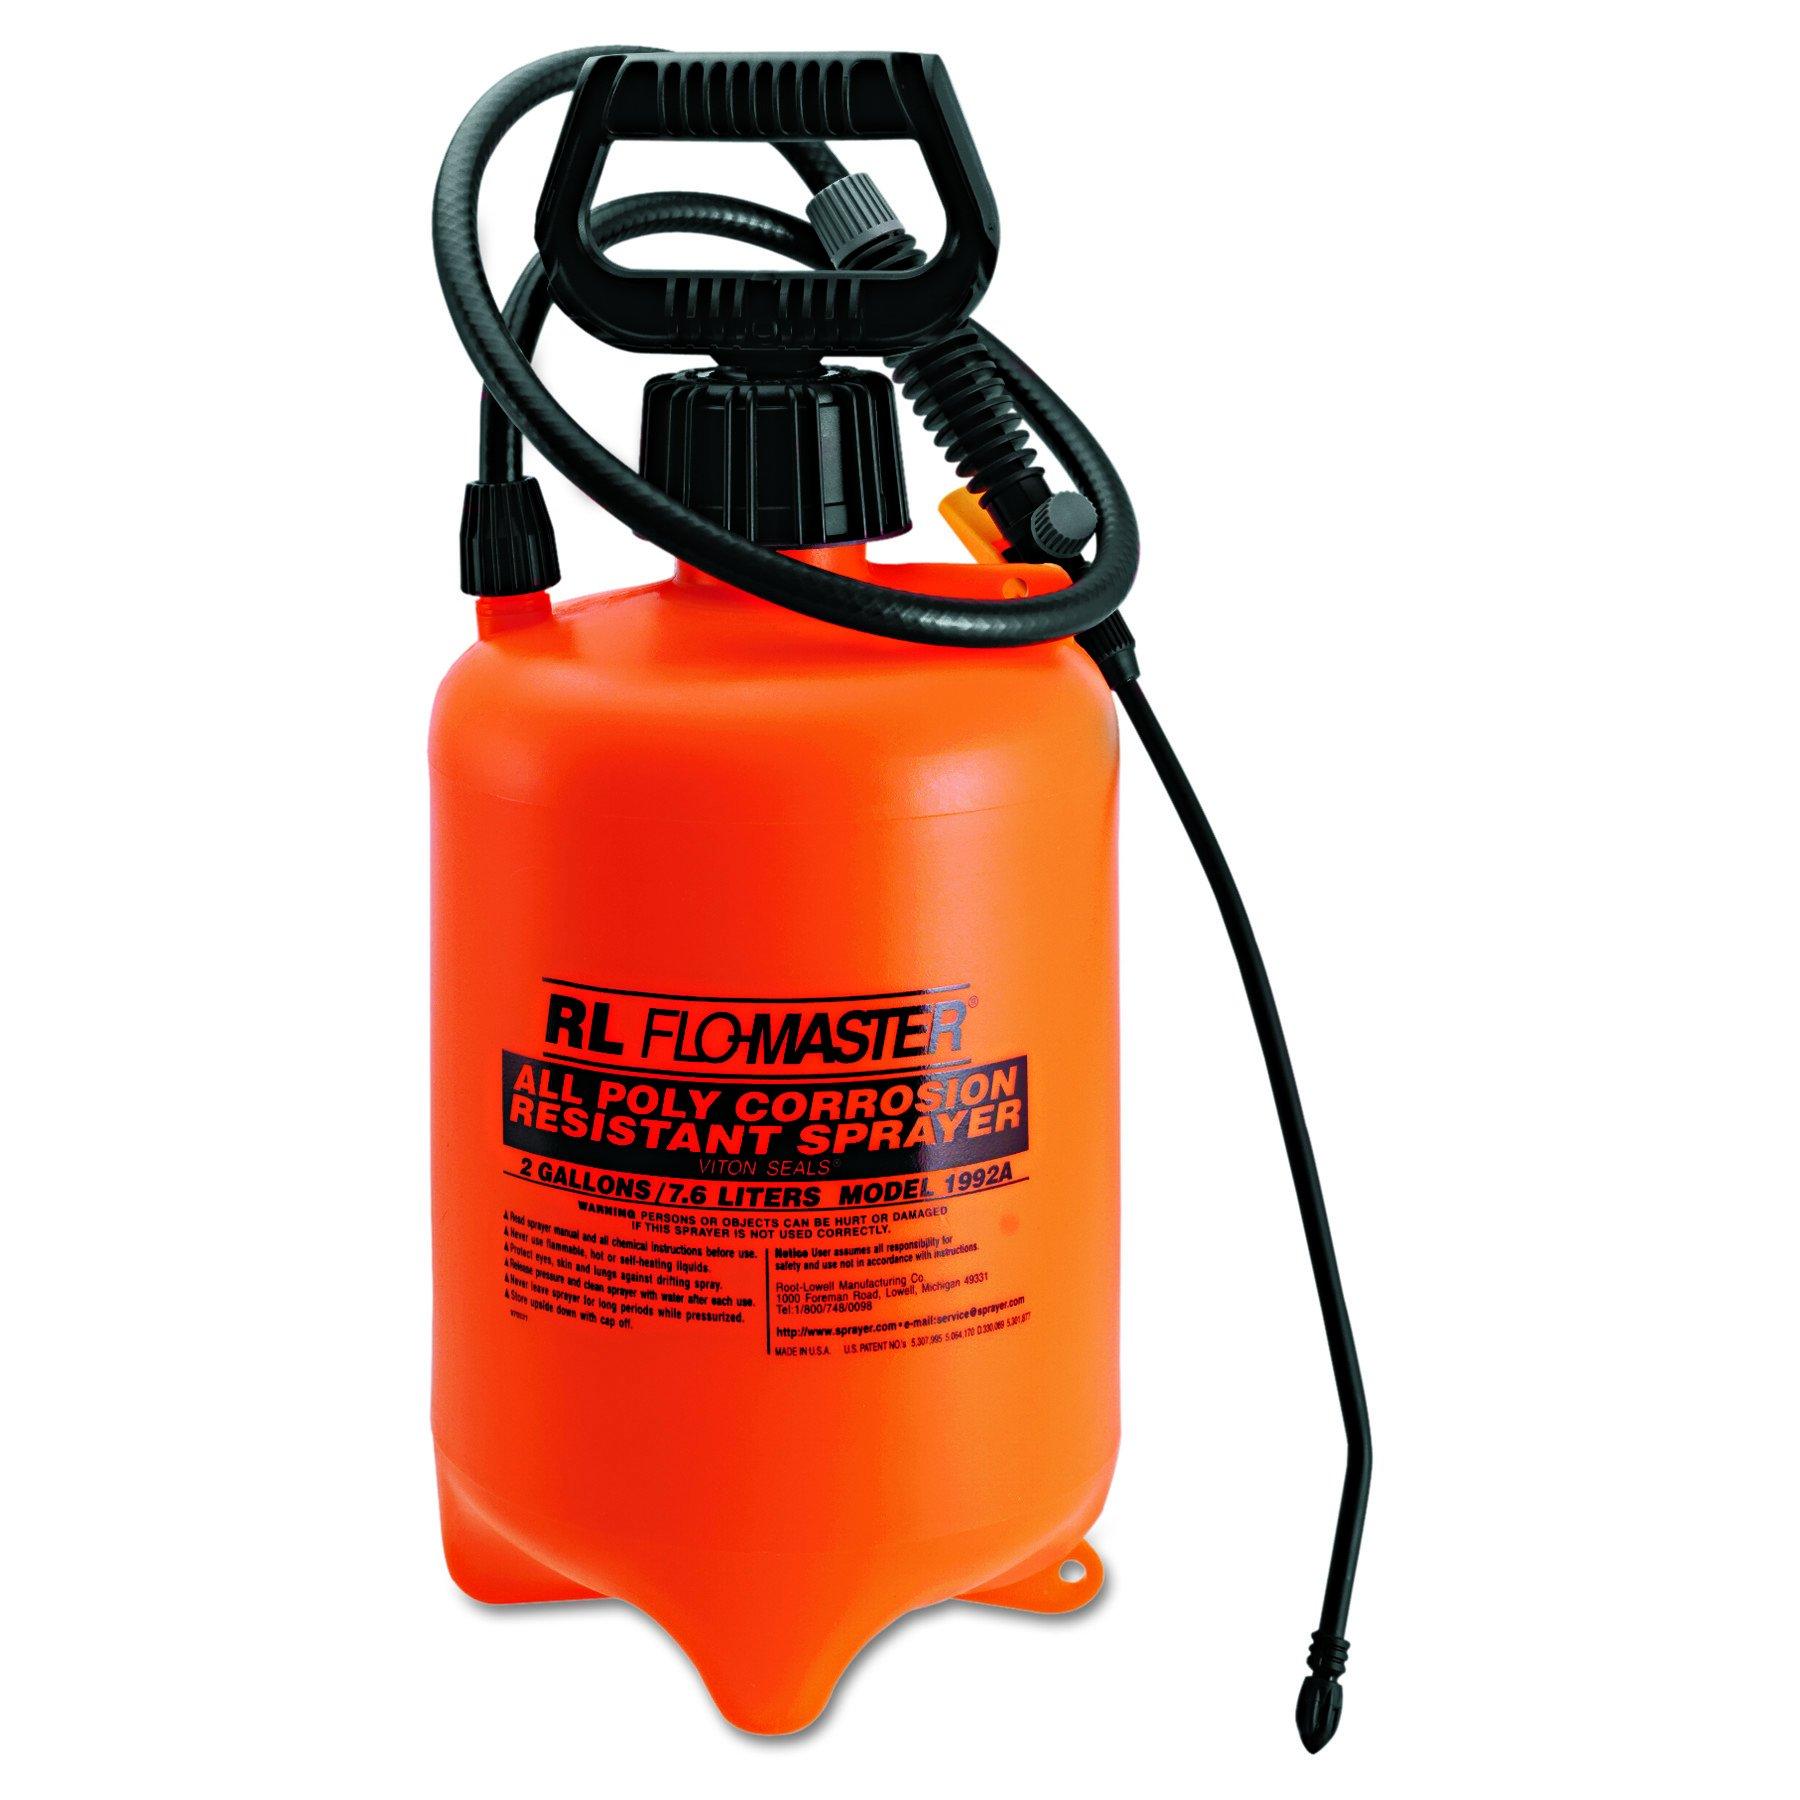 RL Flo-Master 1992A Orange Color, 2 gallon Polyethylene Translucent Acid-Resistant Standard Sprayer